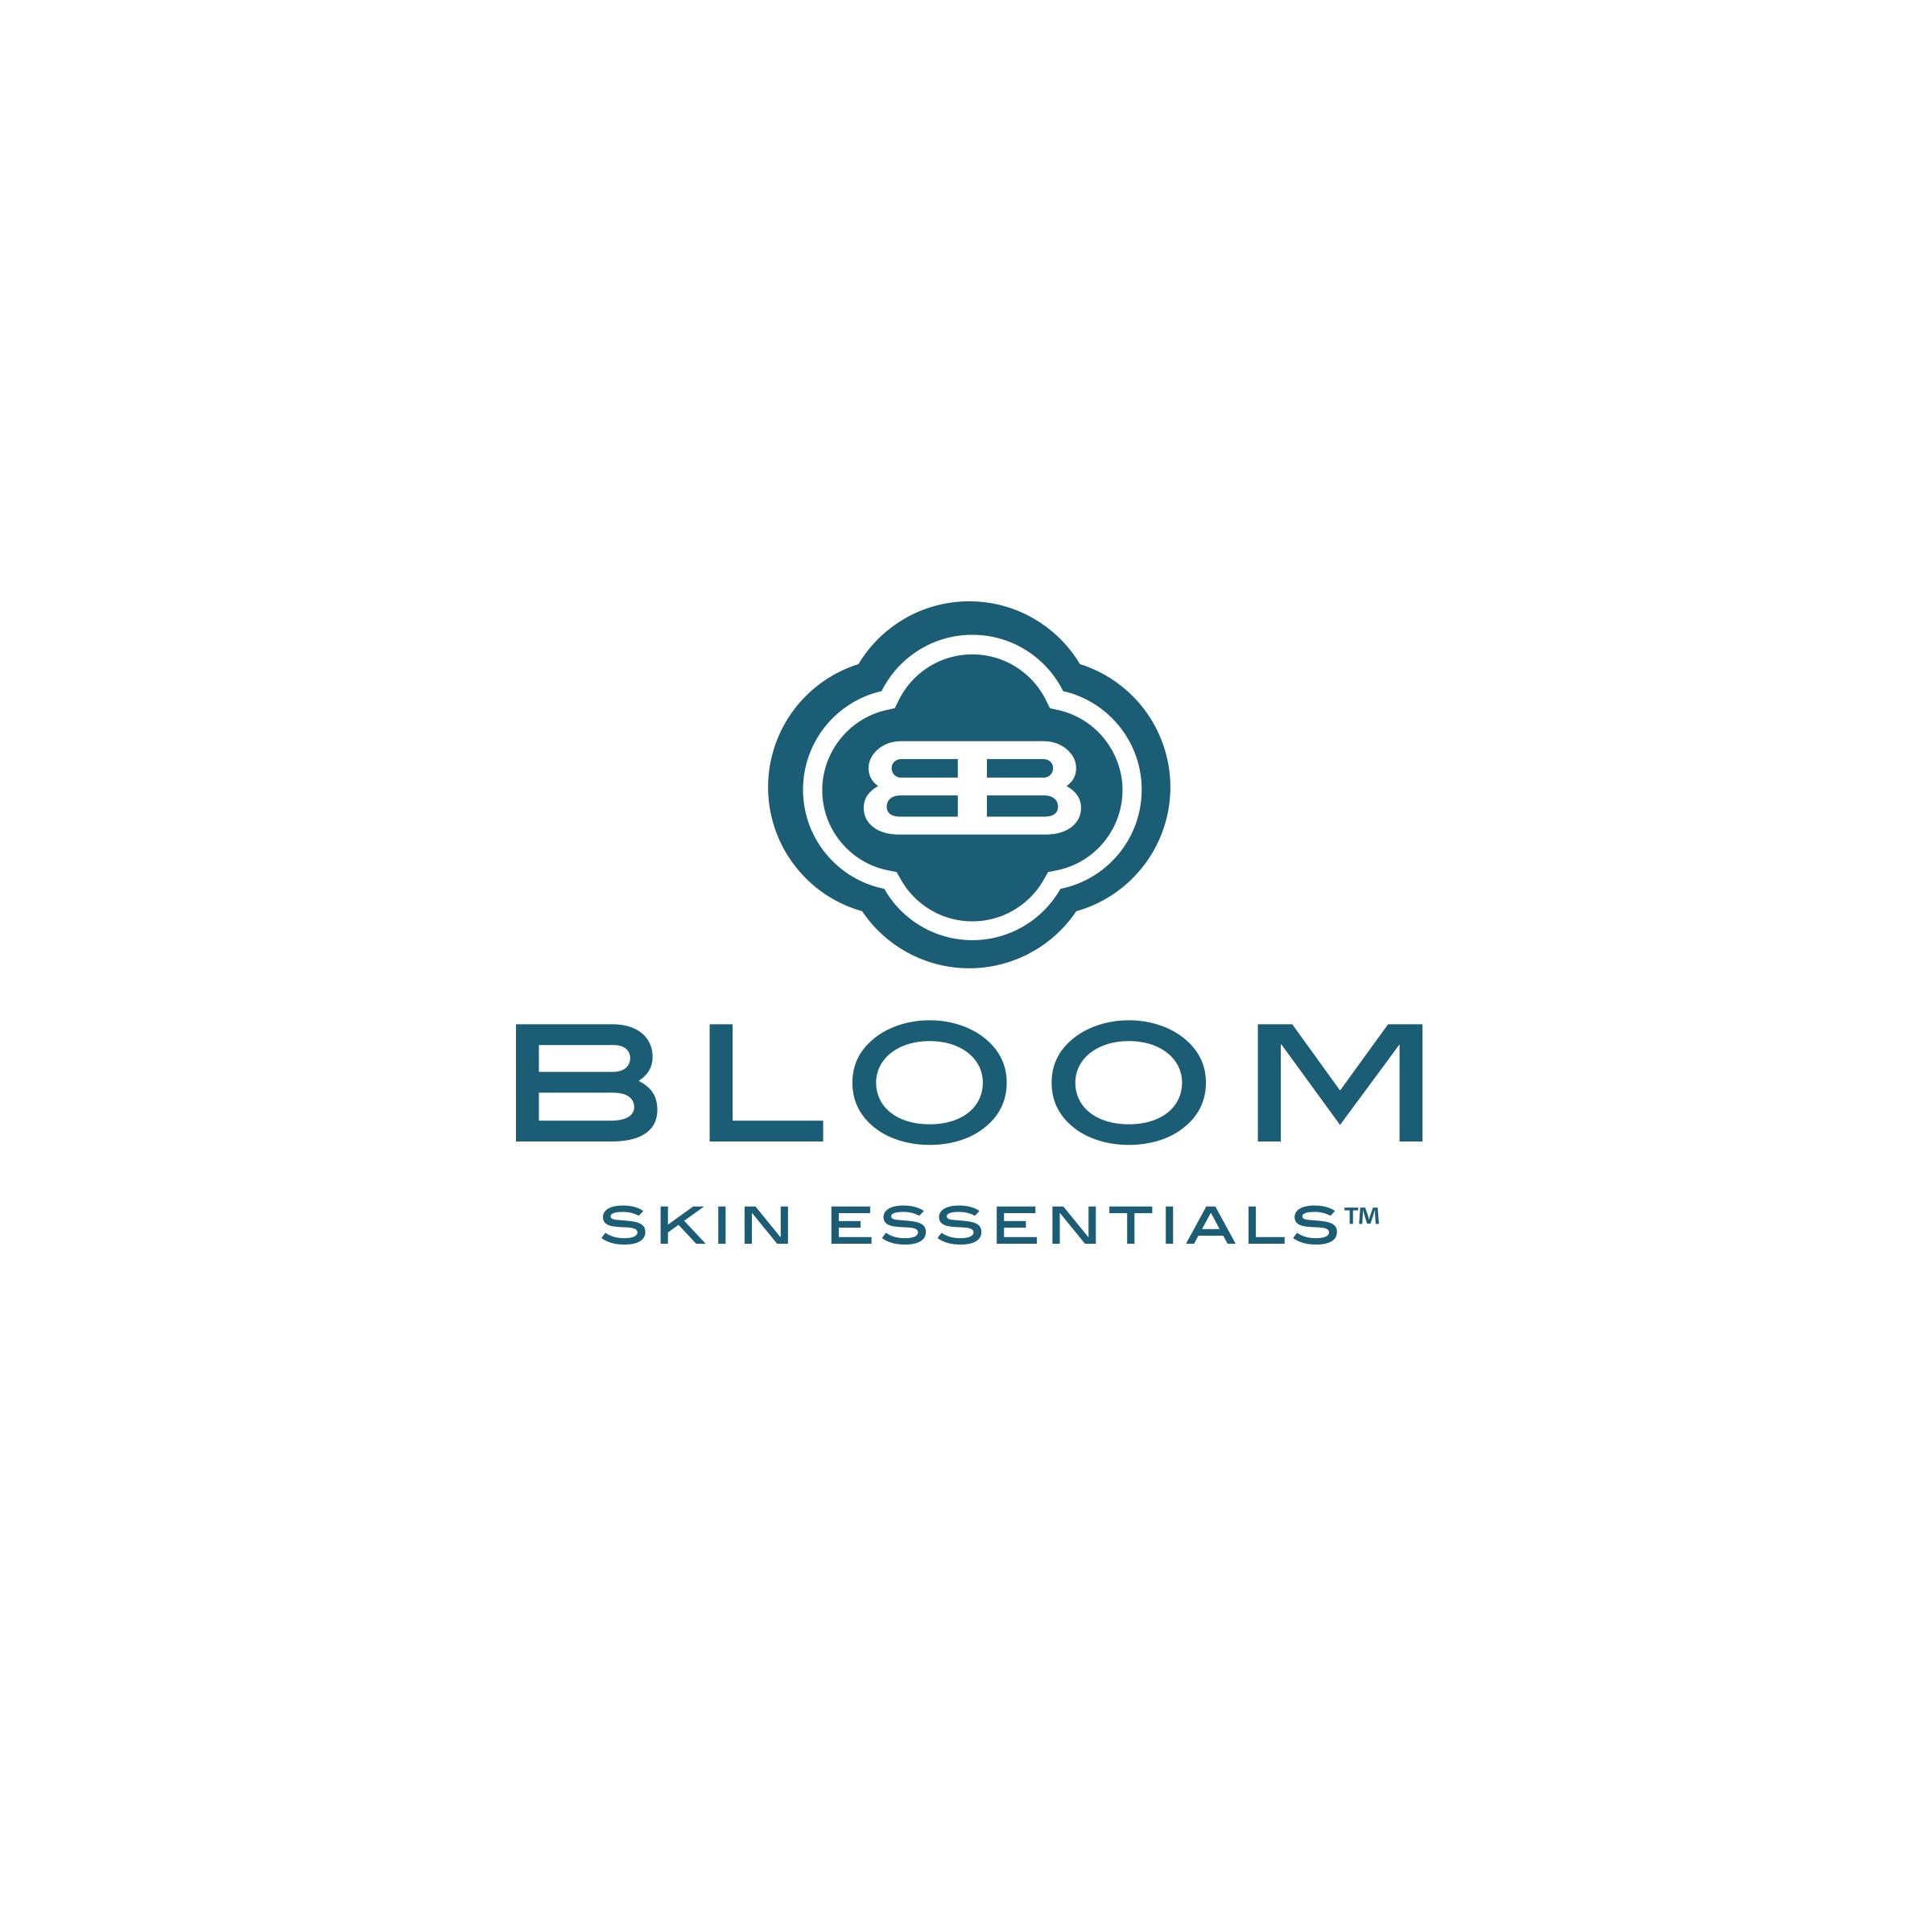 Logo_Bloom.png